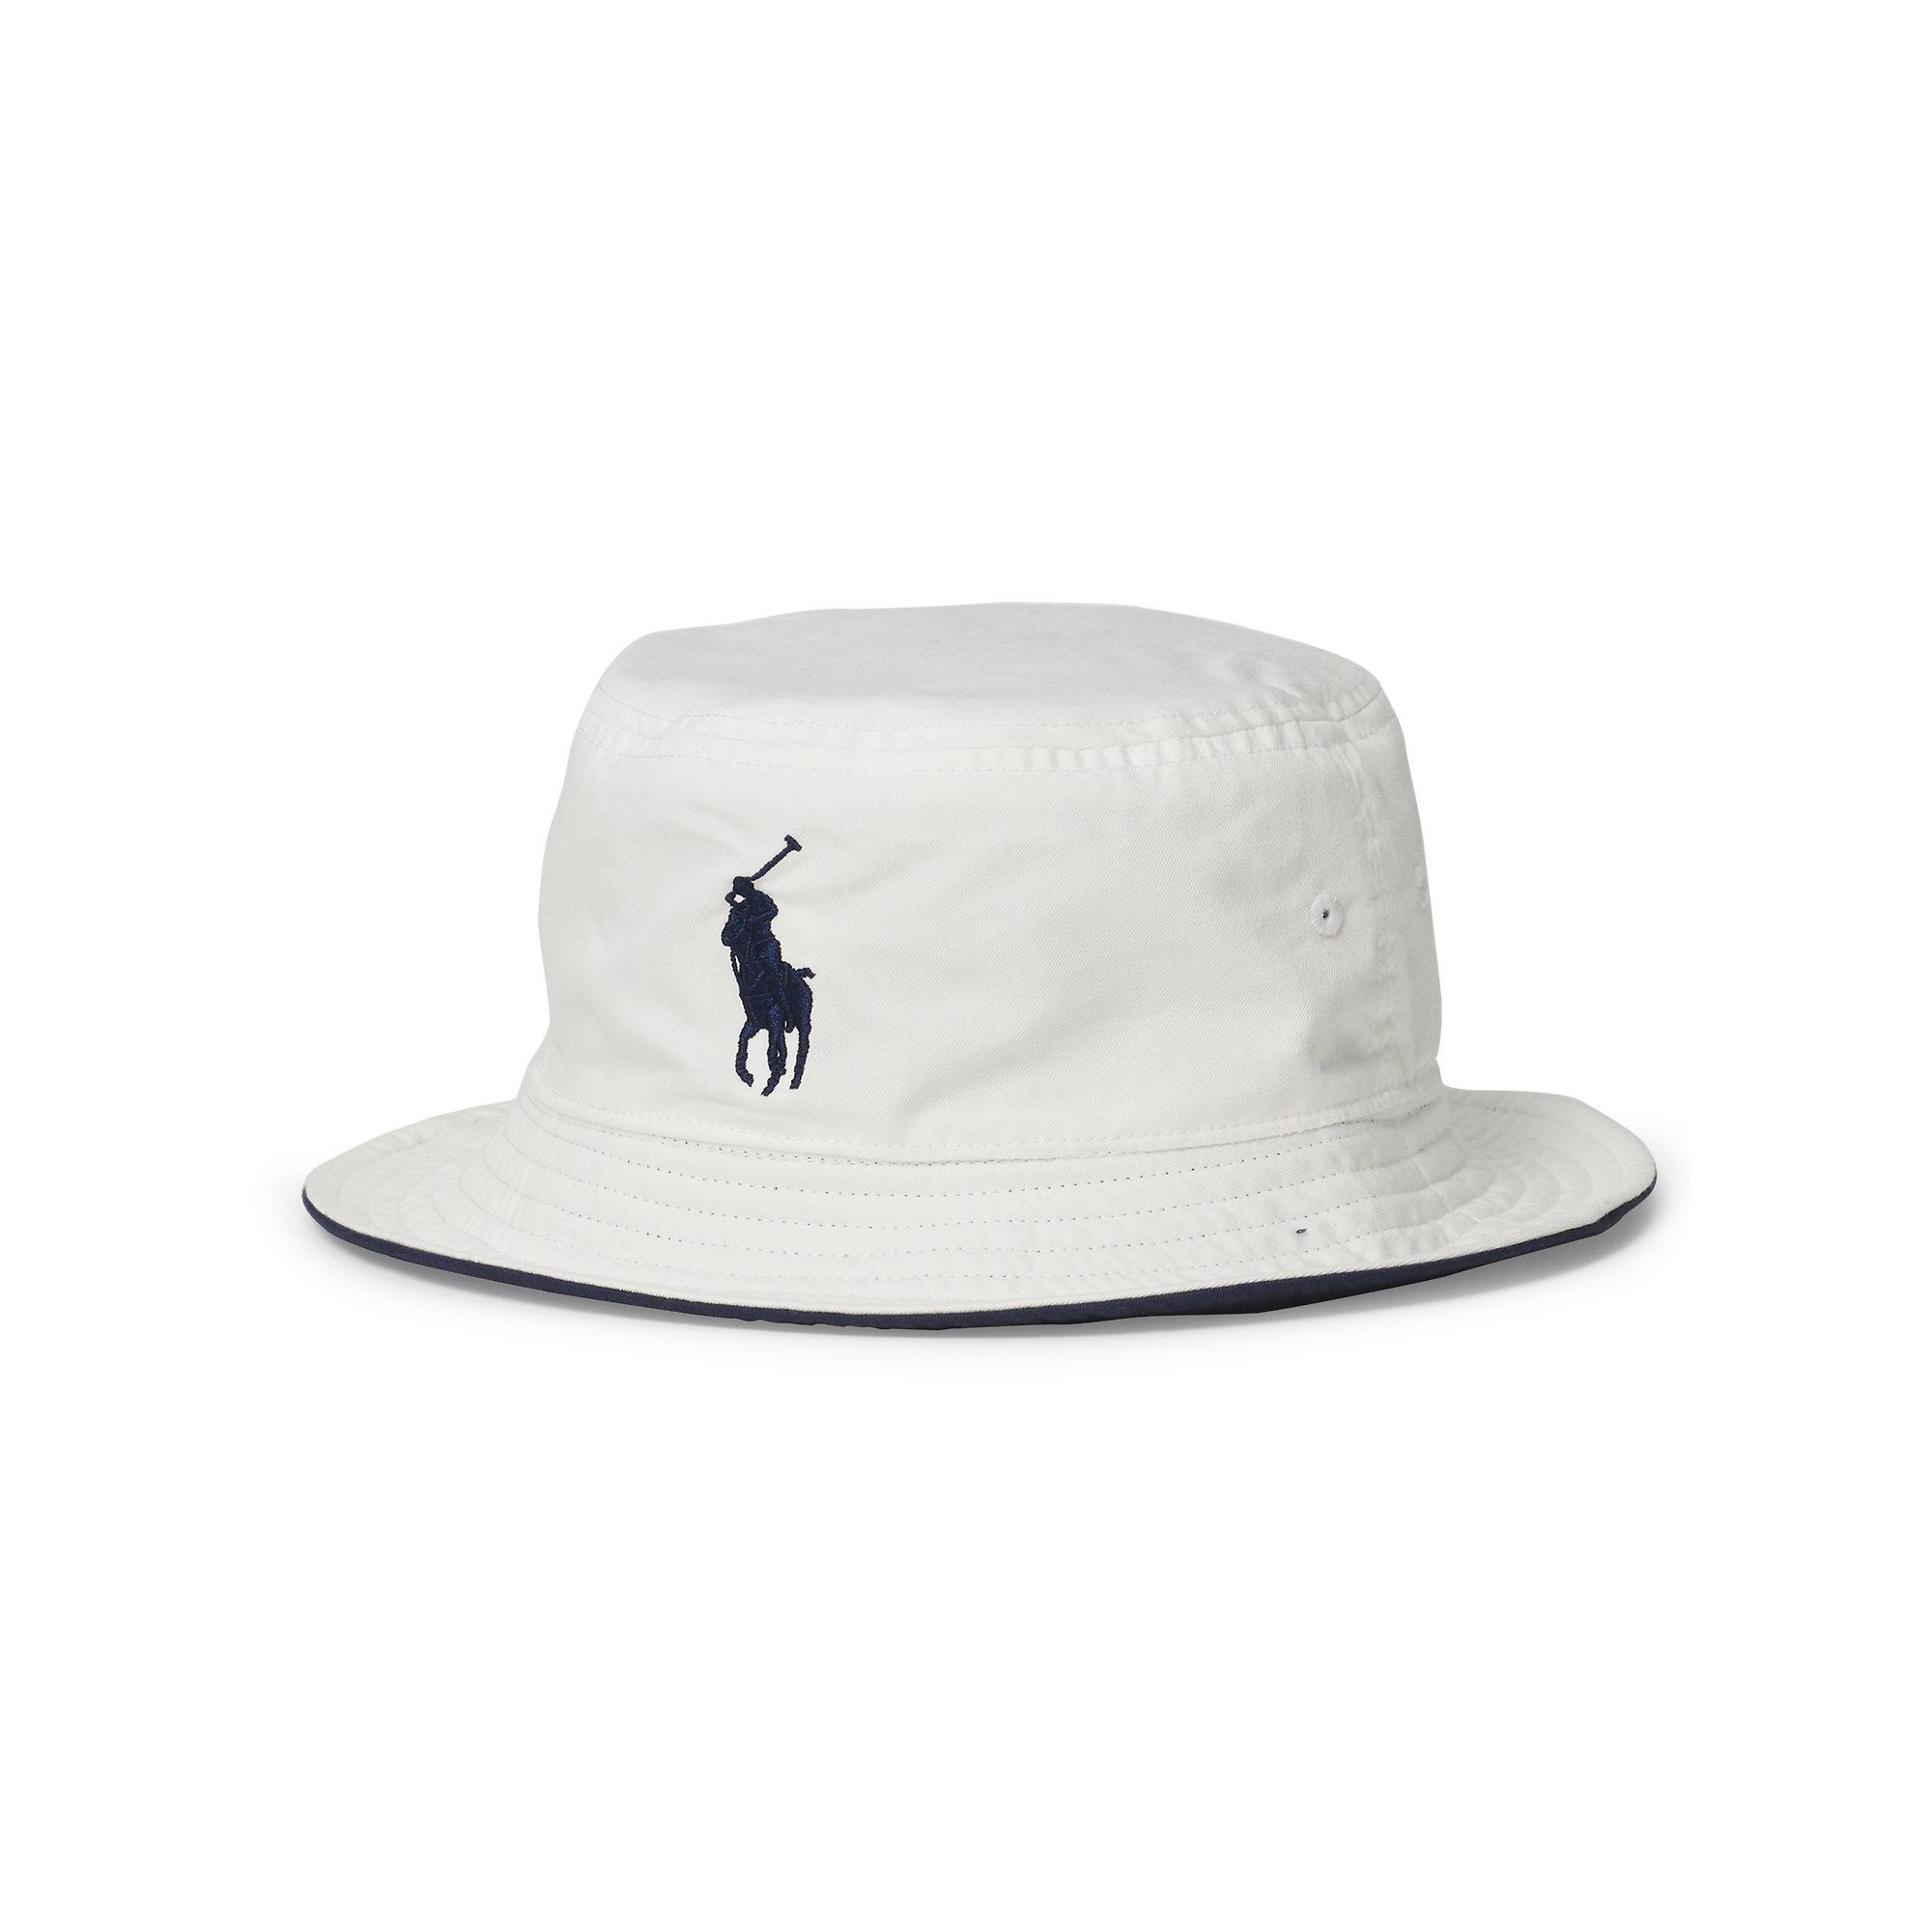 93f2de86e24 Lyst - Polo Ralph Lauren Us Open Reversible Bucket Hat in White for Men